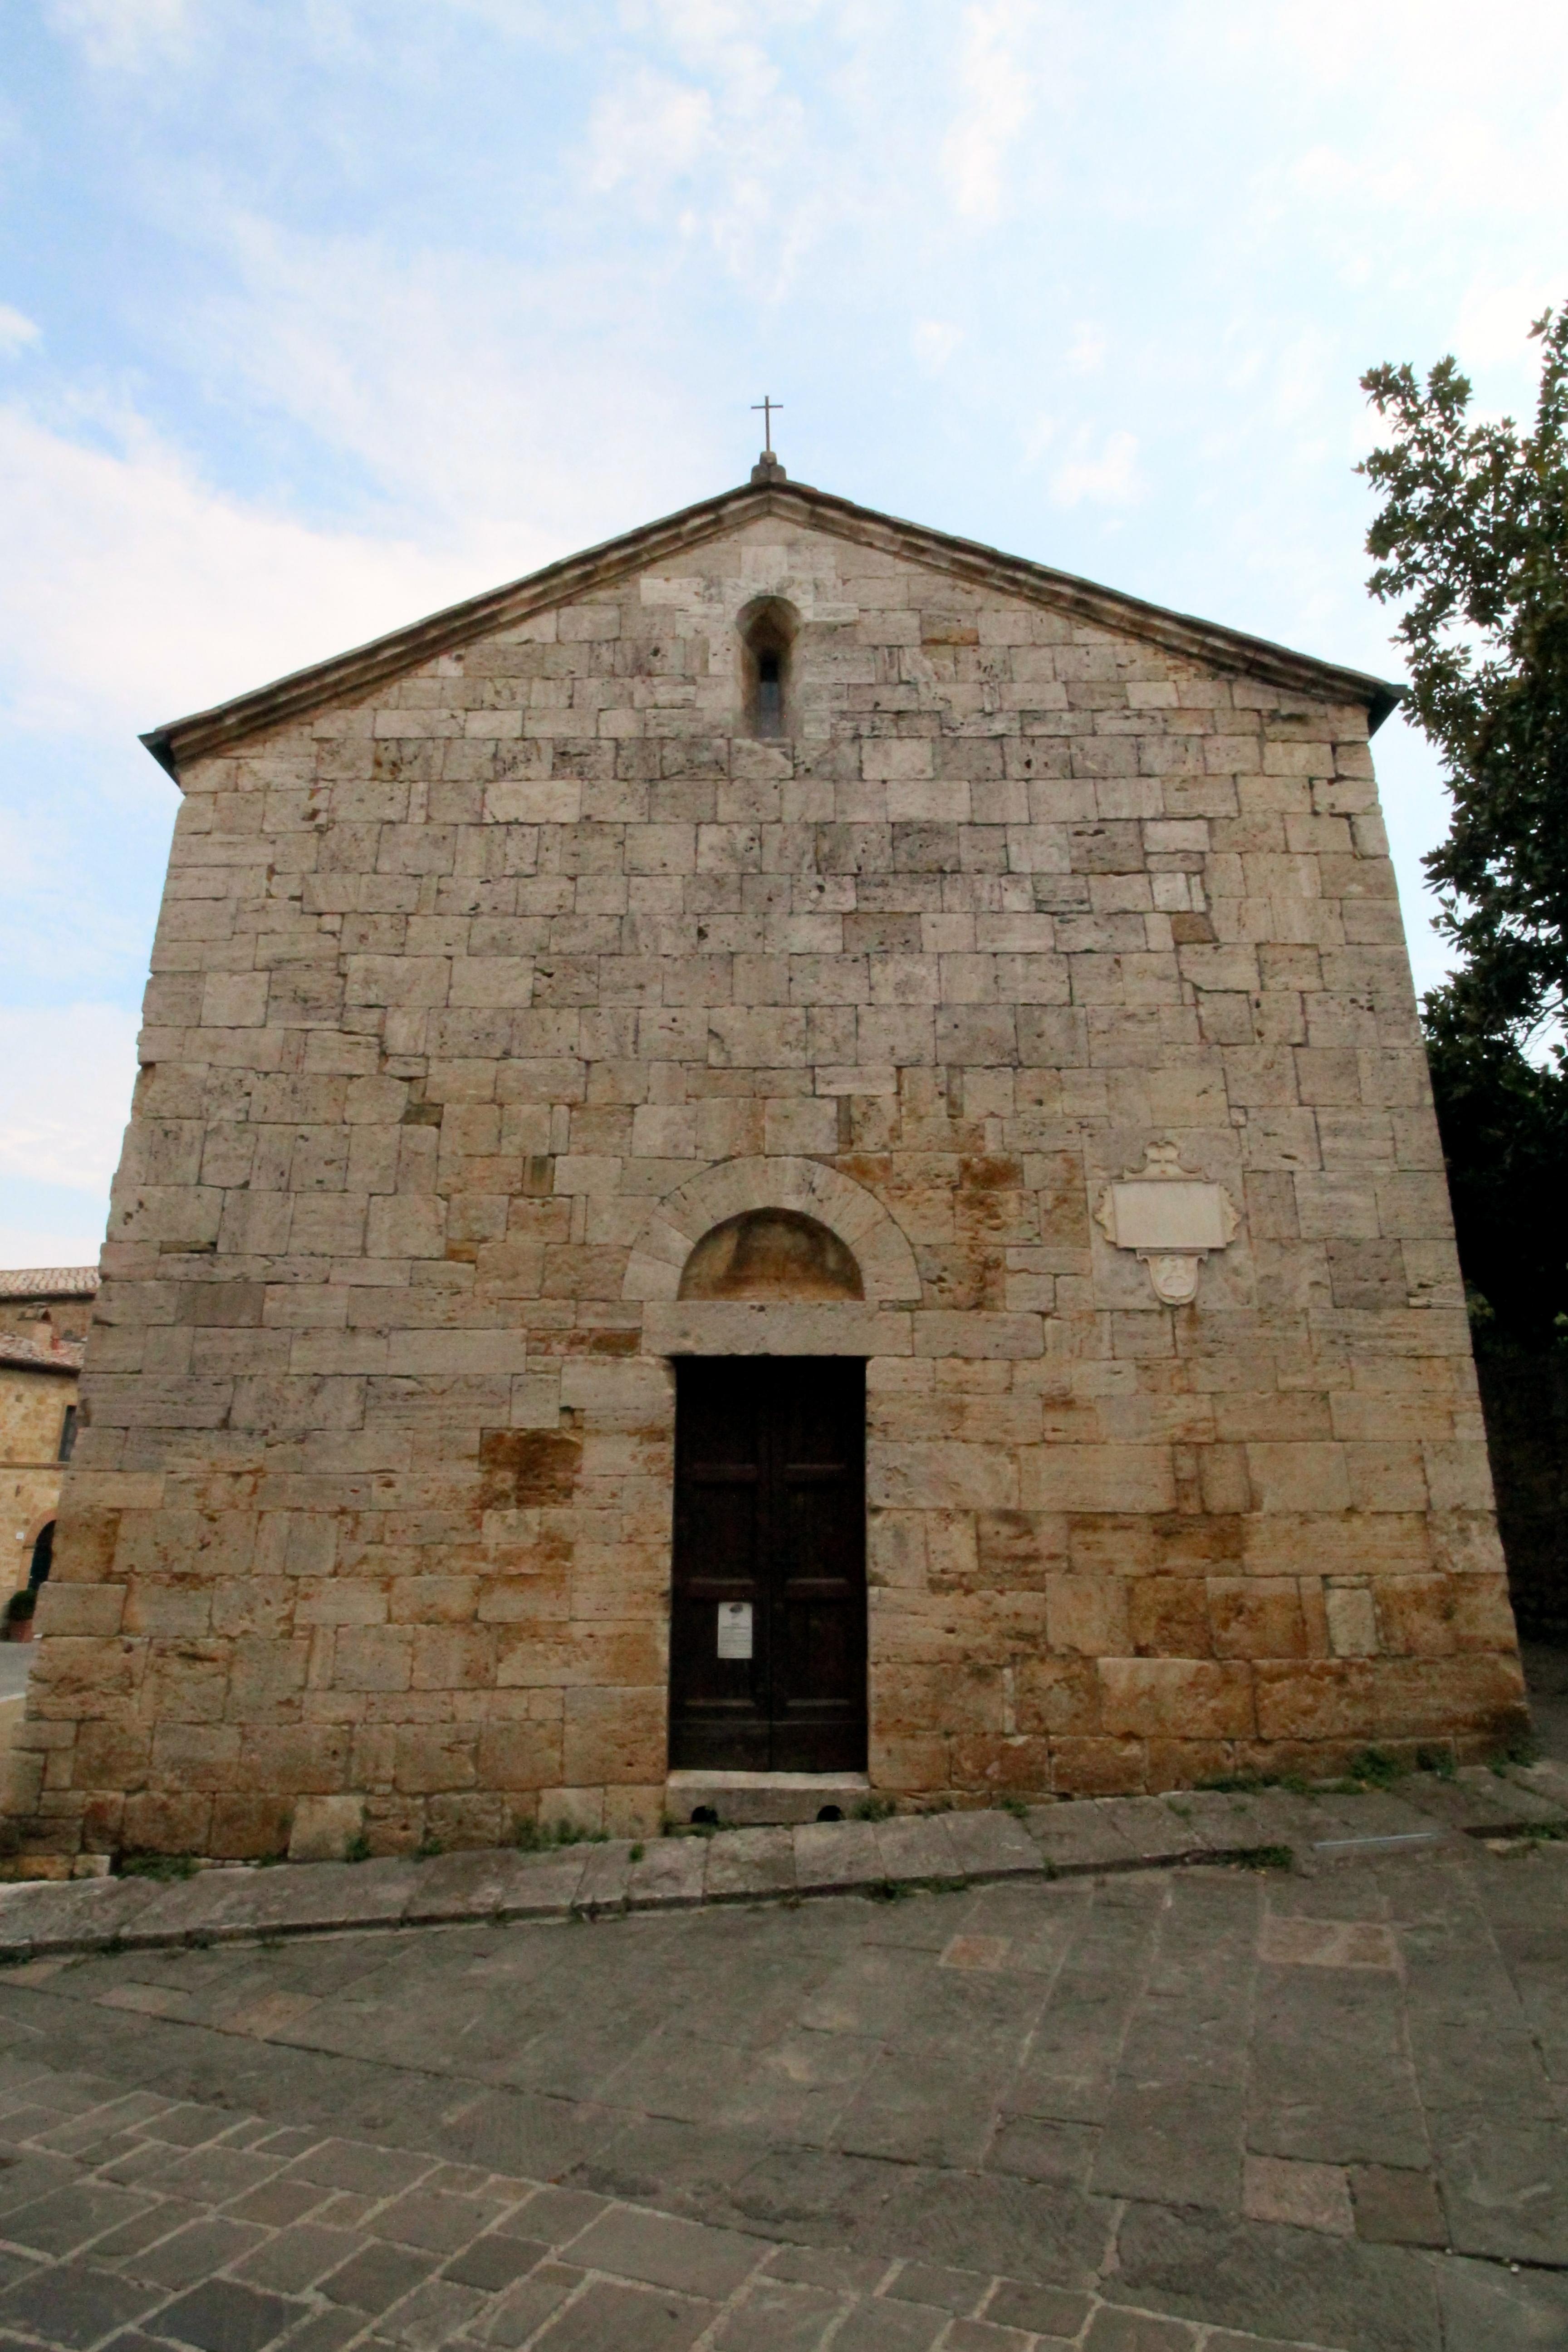 Facade of the Church Santa Maria Assunta, inside the walls of San Quirico d'Orcia, Province of Siena, Tuscany